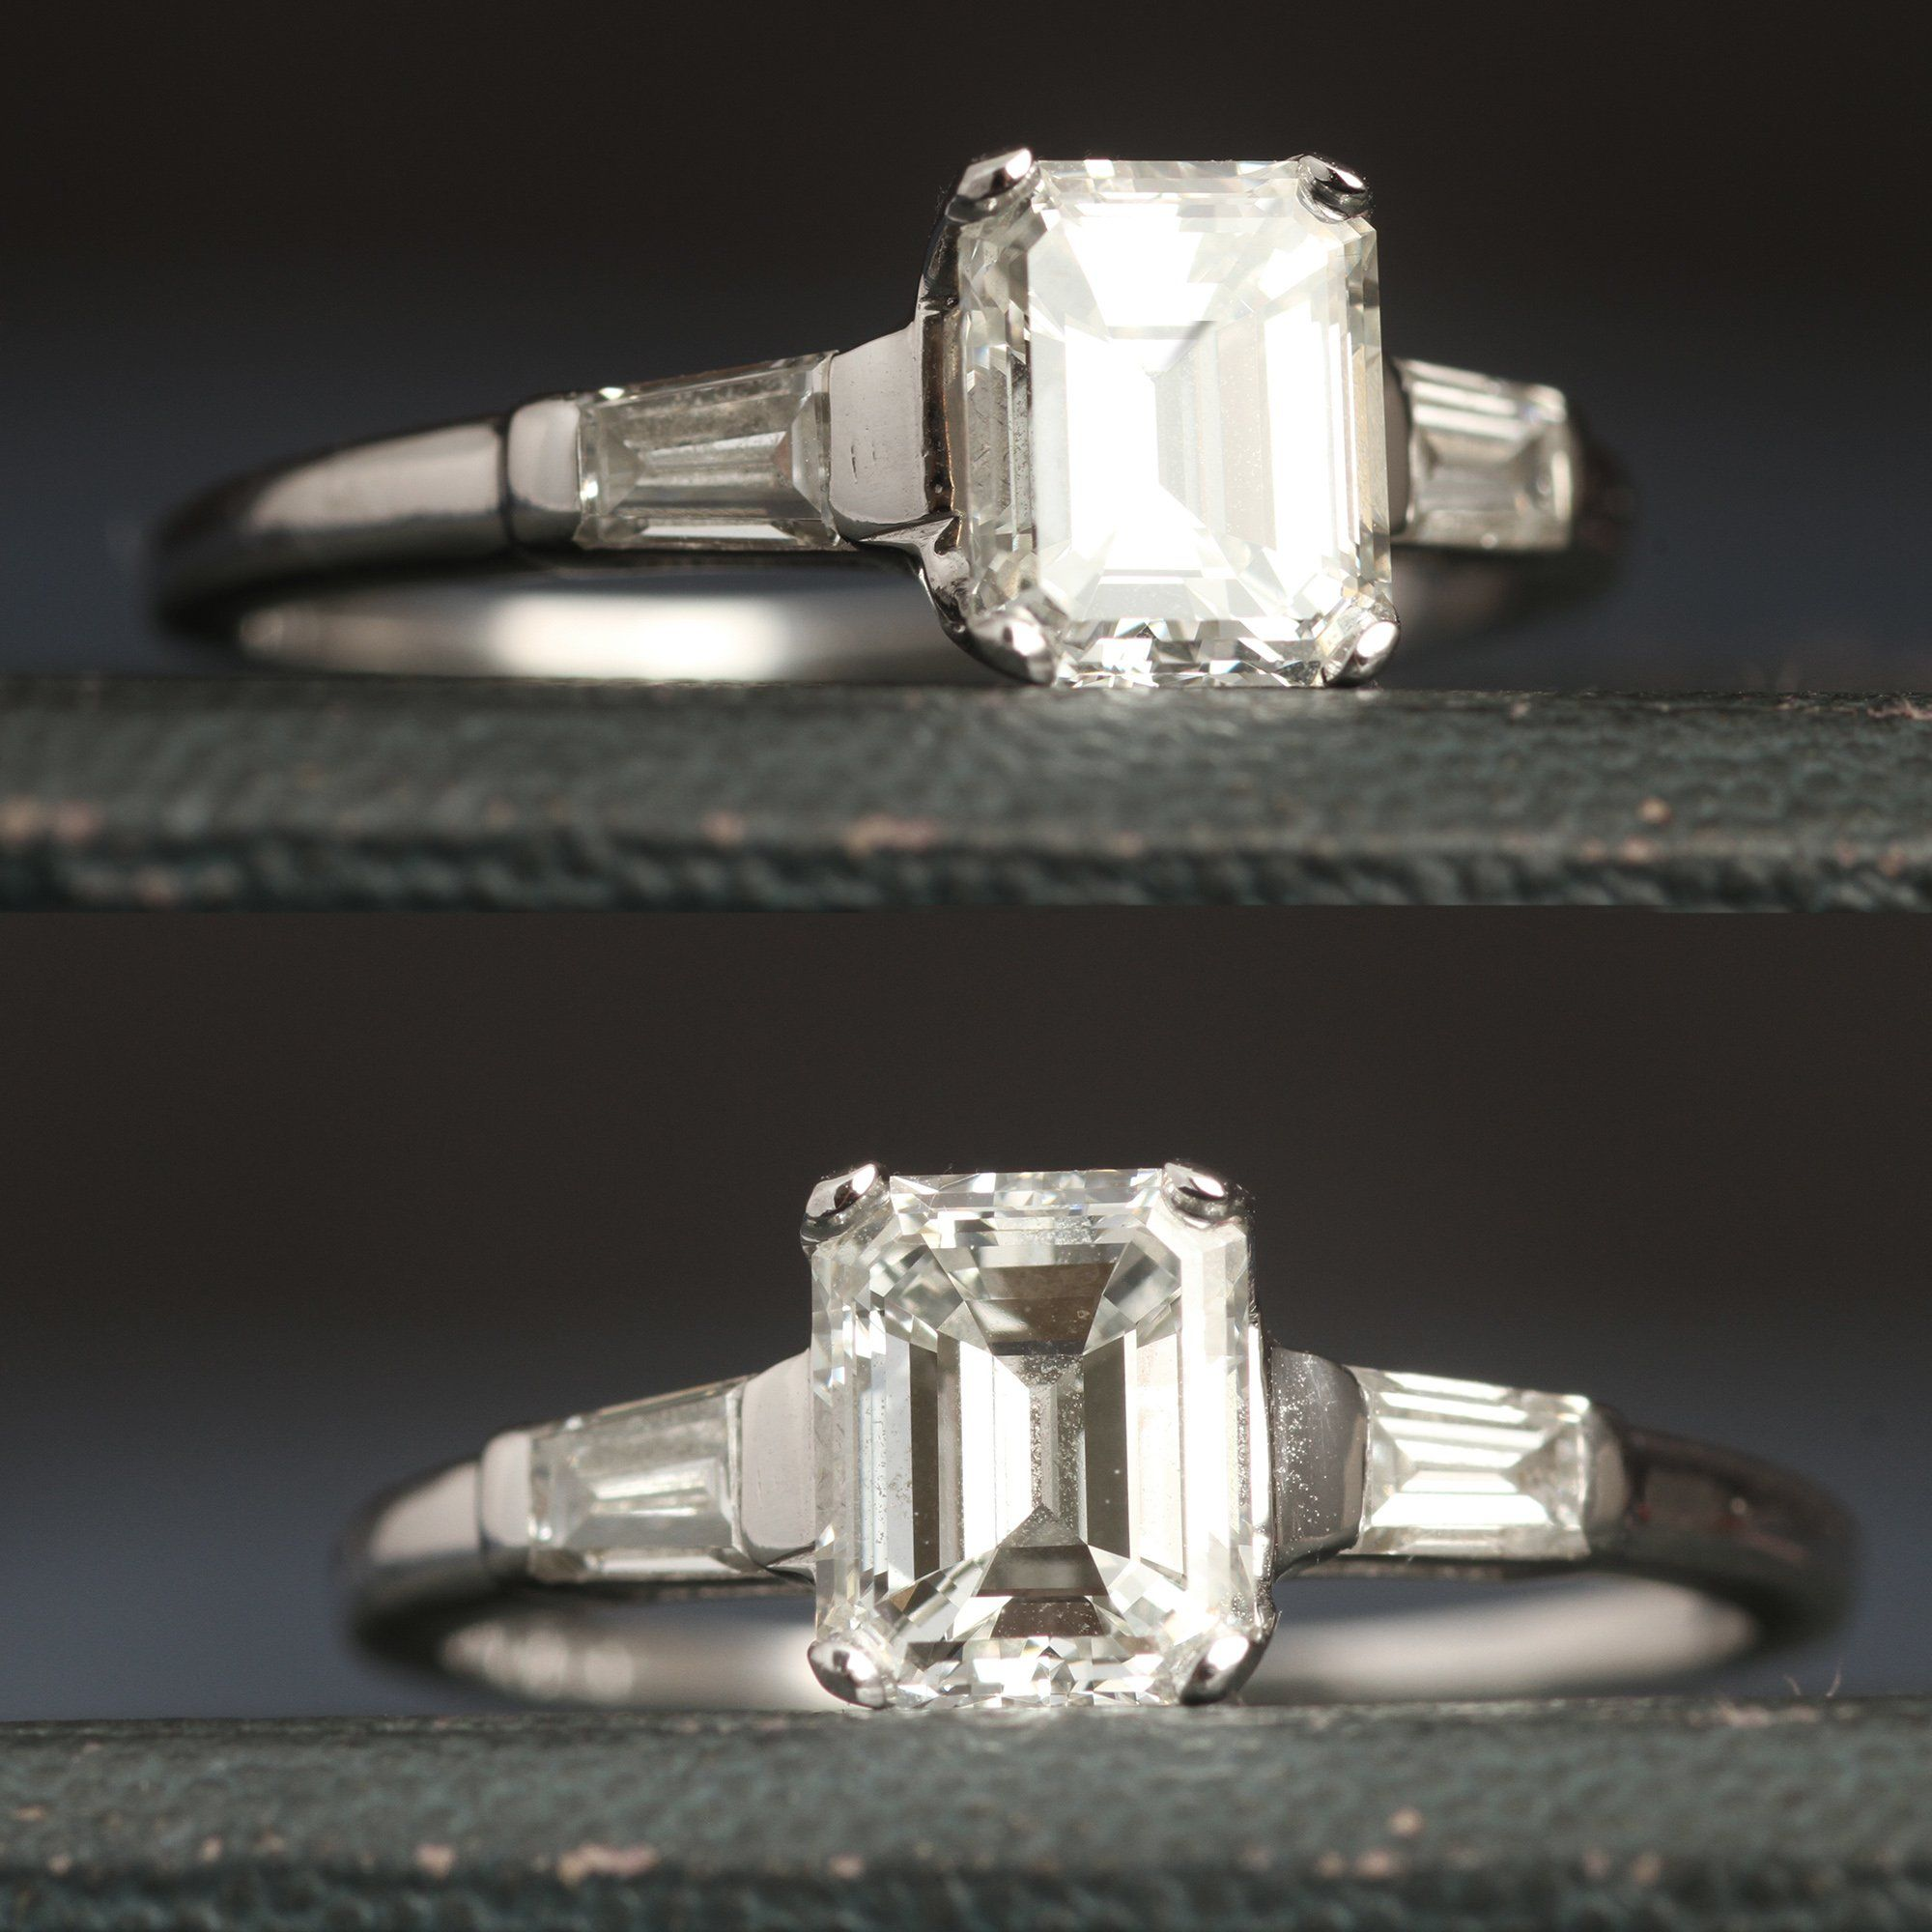 Vintage 1.14ct Emerald Cut Diamond Engagement Ring